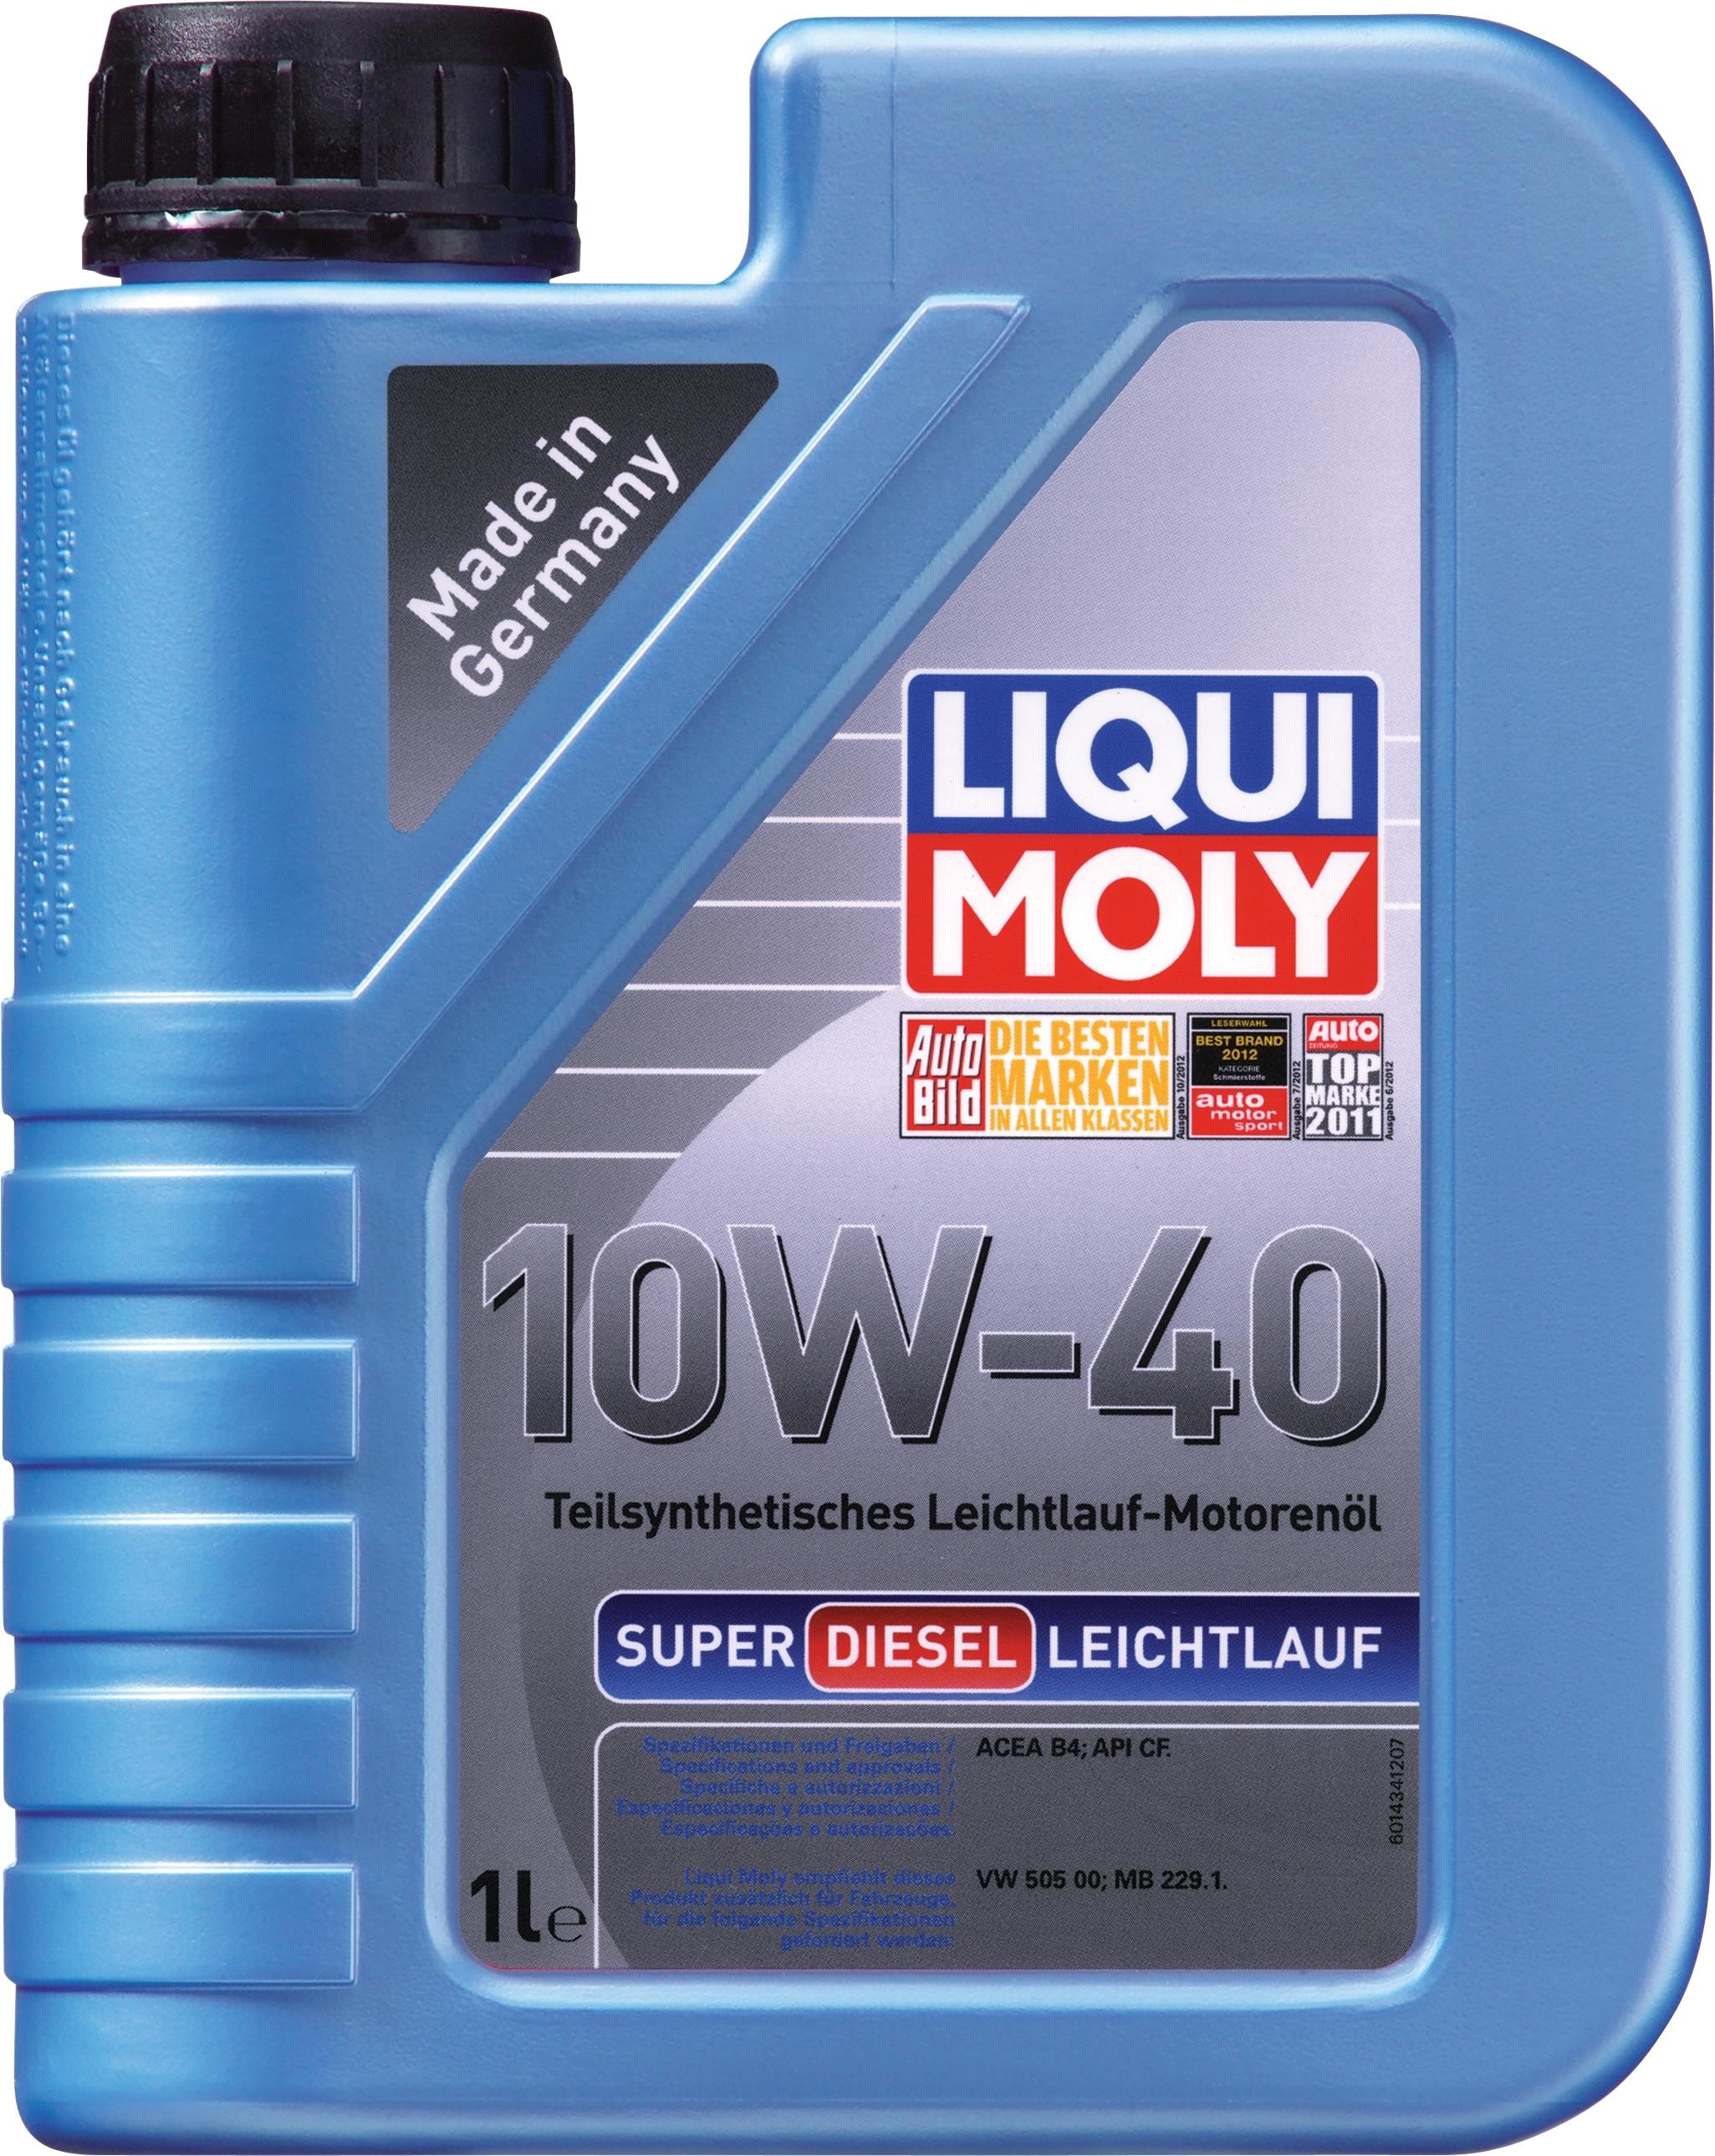 Моторное масло Liqui Moly Super Diesel Leichtlauf 10W-40 1л